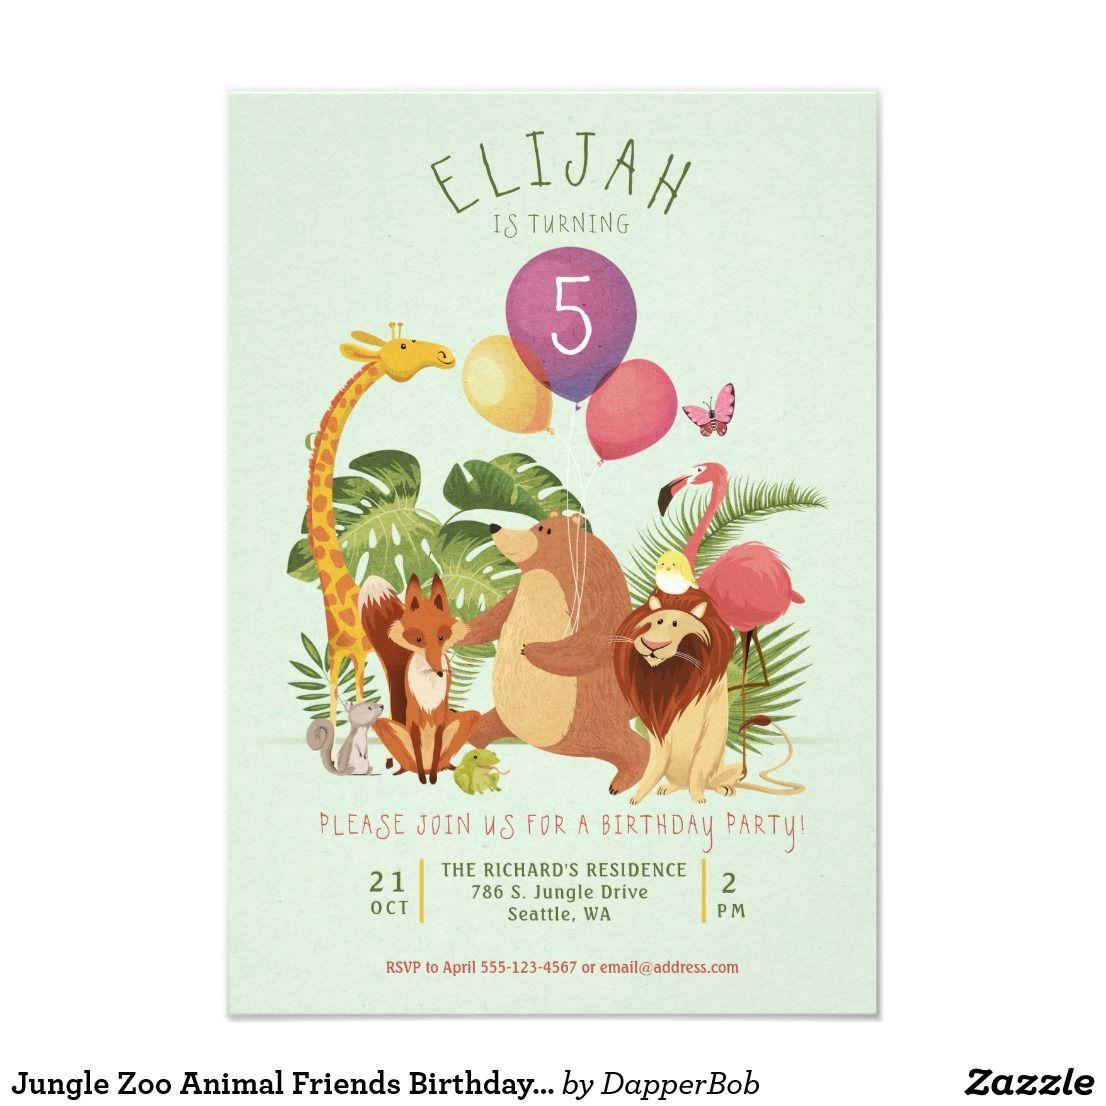 Jungle zoo animal friends birthday party invite jungle zoo animal friends birthday party invite critter parade of jungle and zoo animals bear stopboris Gallery